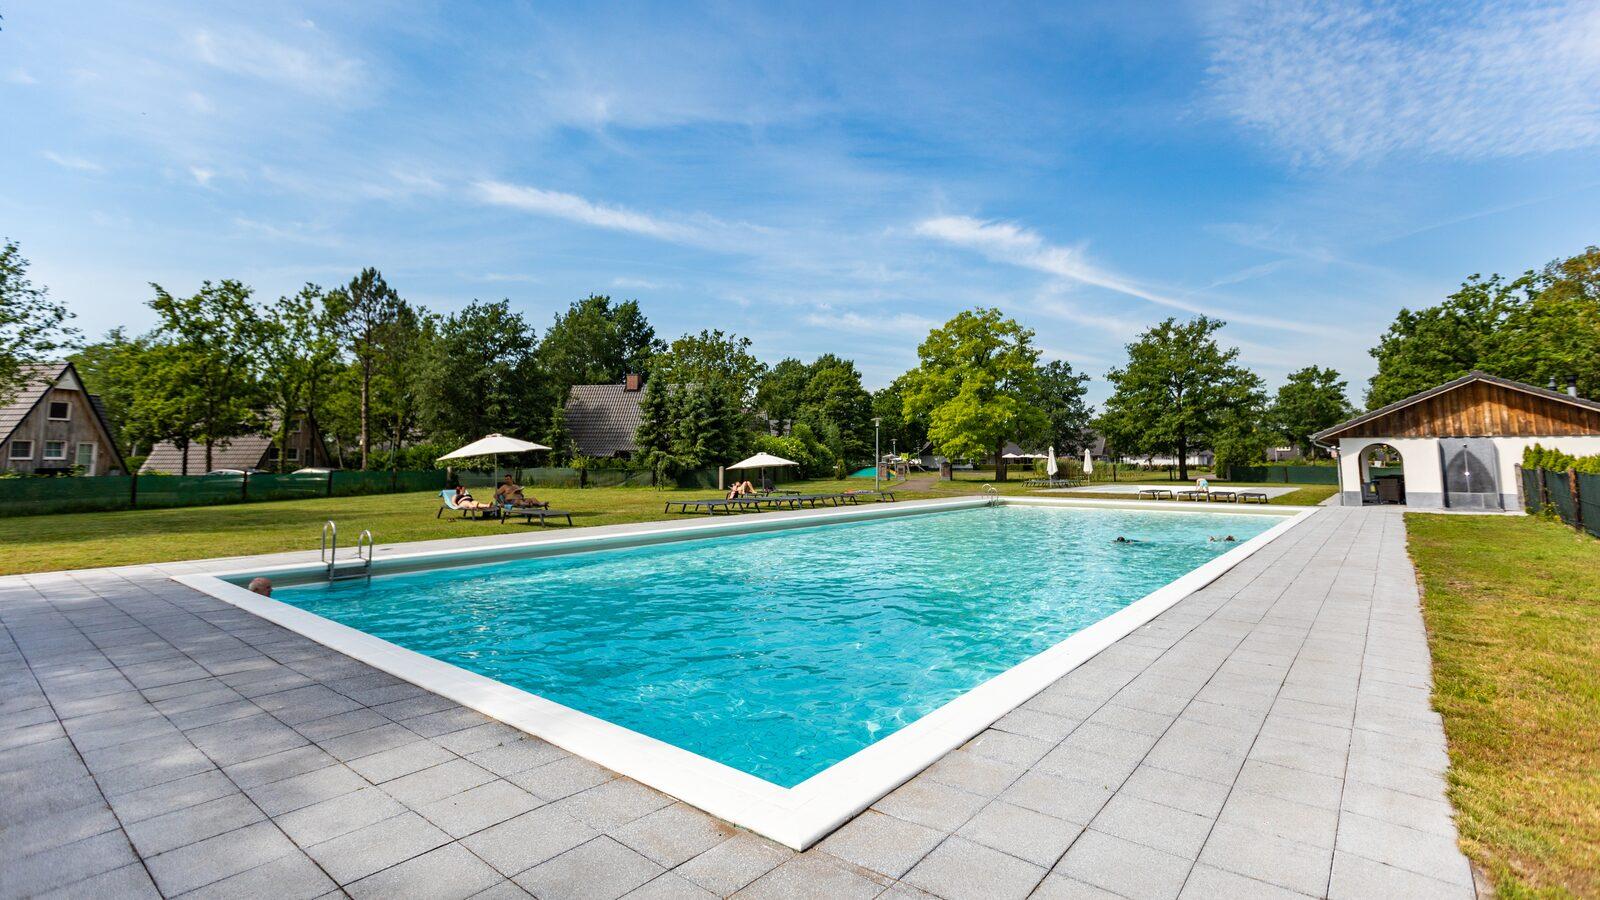 Pool 🏊